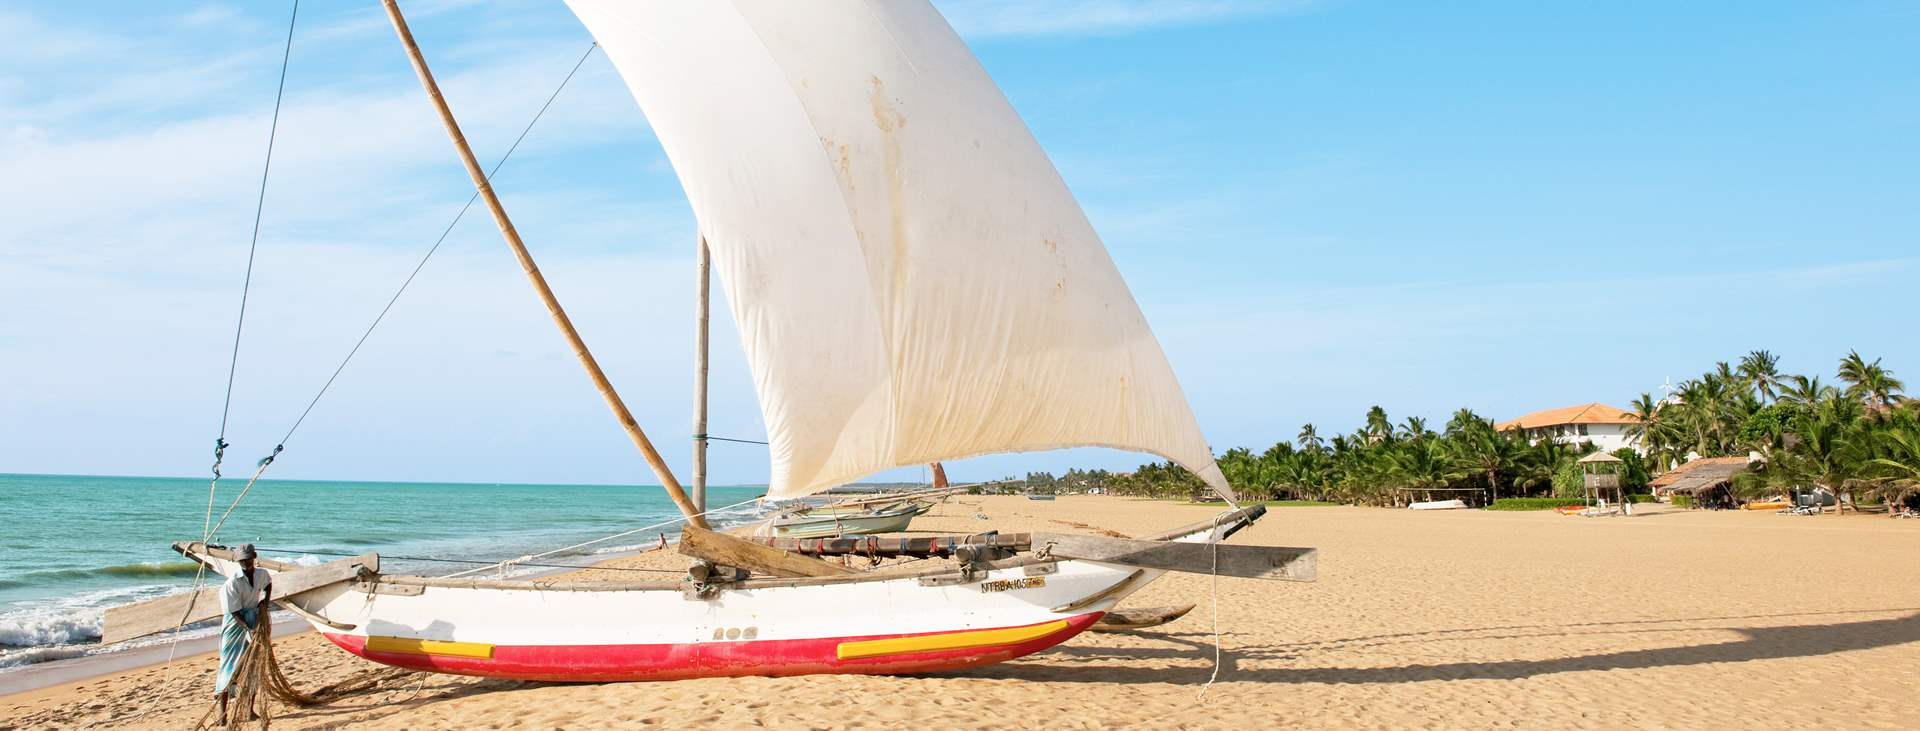 Boka din resa till Negombo på Sri Lanka med Ving